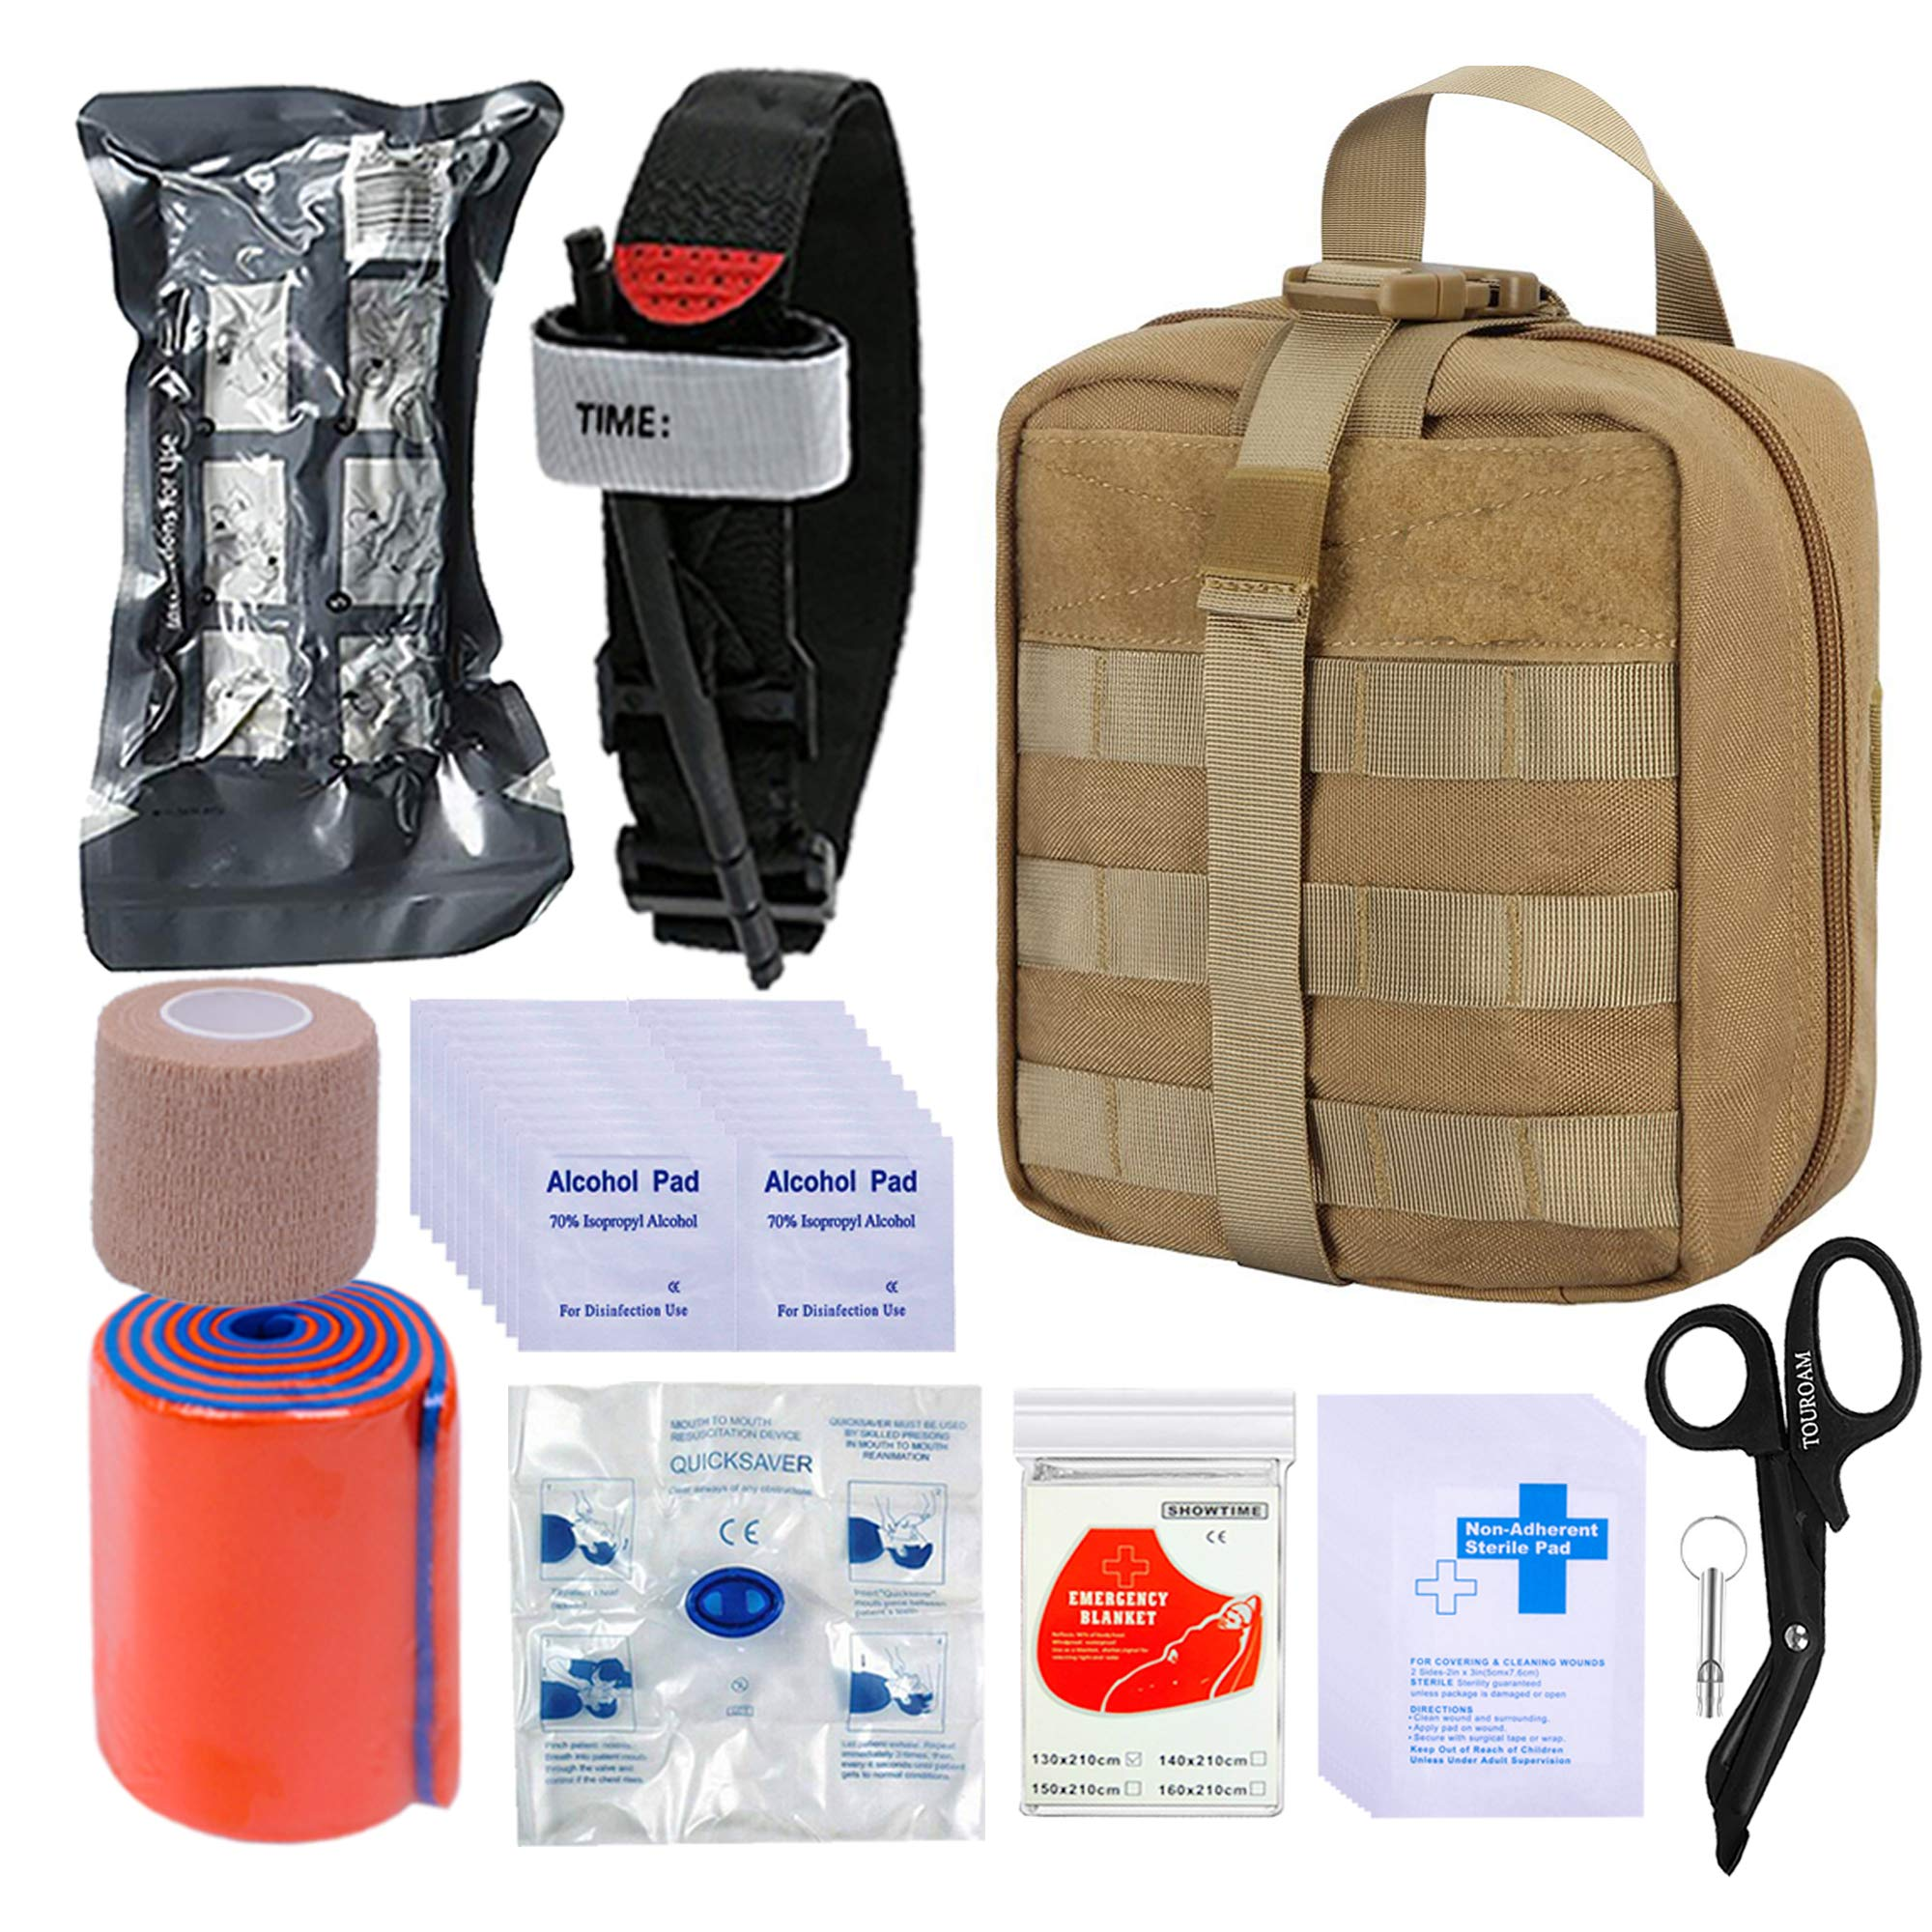 BUSIO Kit de Primeros Auxilios tácticos de Emergencia-MOLLE Admin Pouch IFAK-Vendaje para heridas Control de Sangre EMT Survival Trauma Kit-Camp Travel Car Kit: Amazon.es: Deportes y aire libre